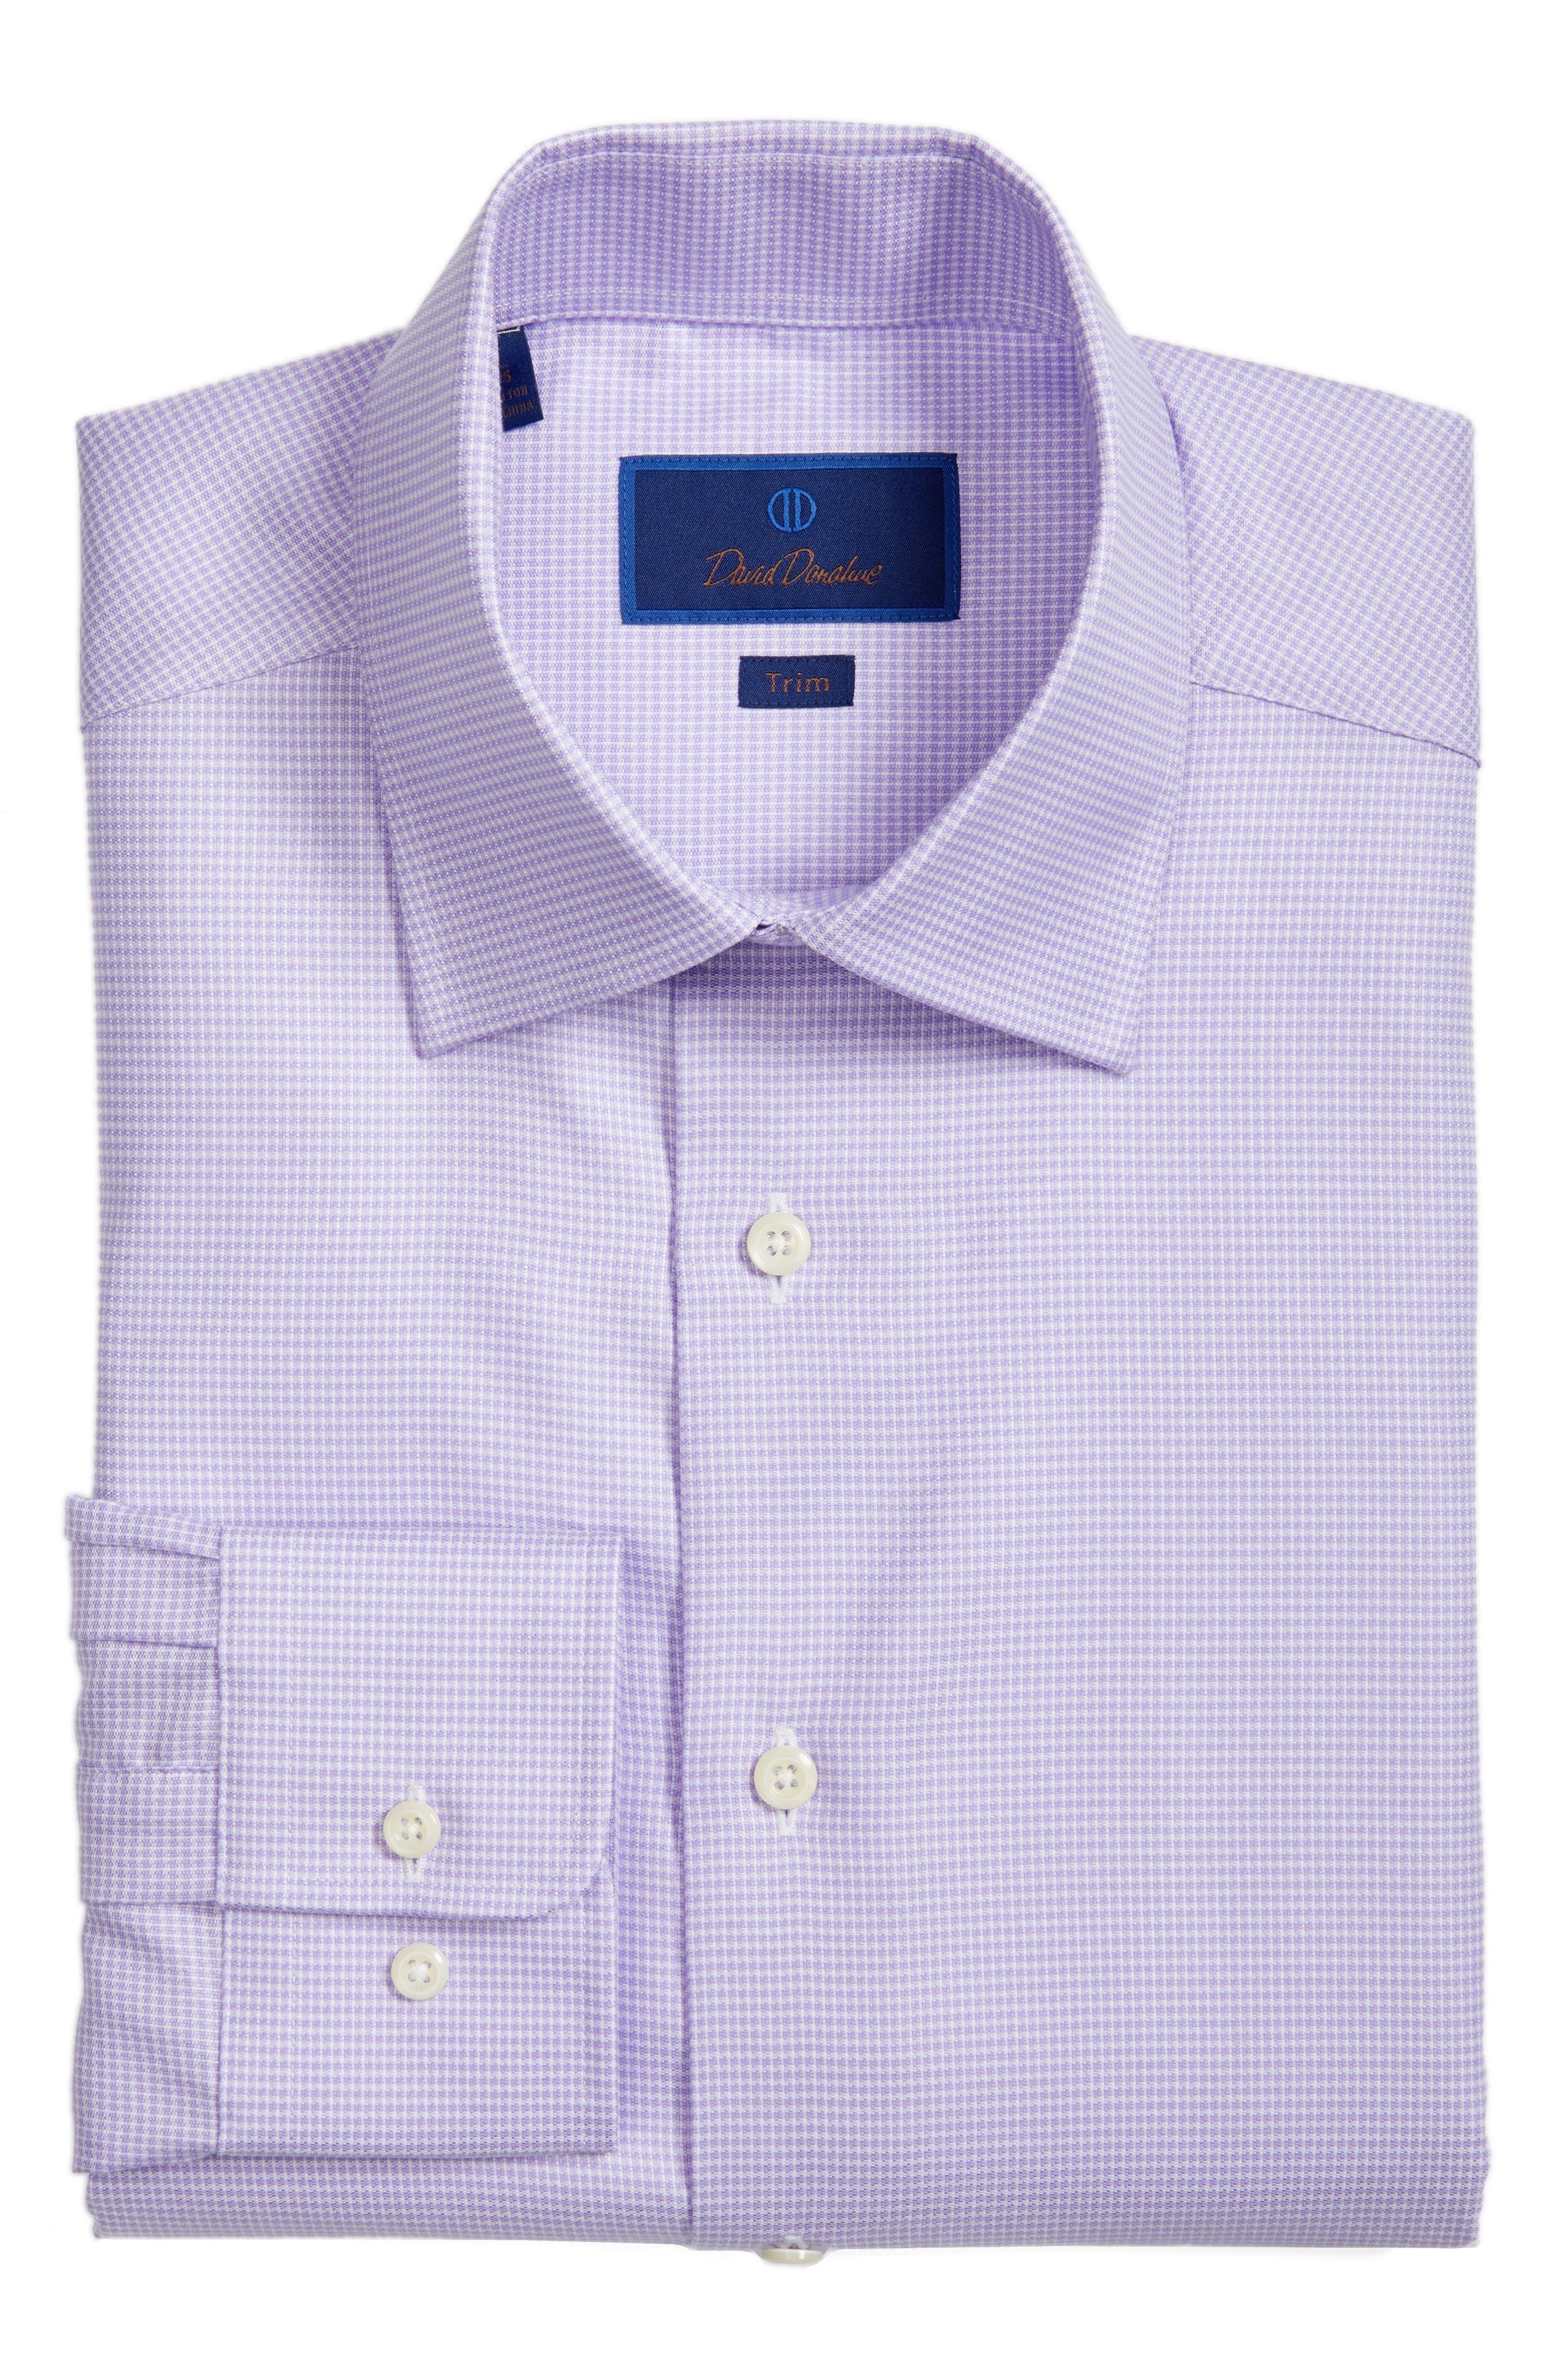 Trim Fit Houndstooth Dress Shirt,                             Alternate thumbnail 3, color,                             534